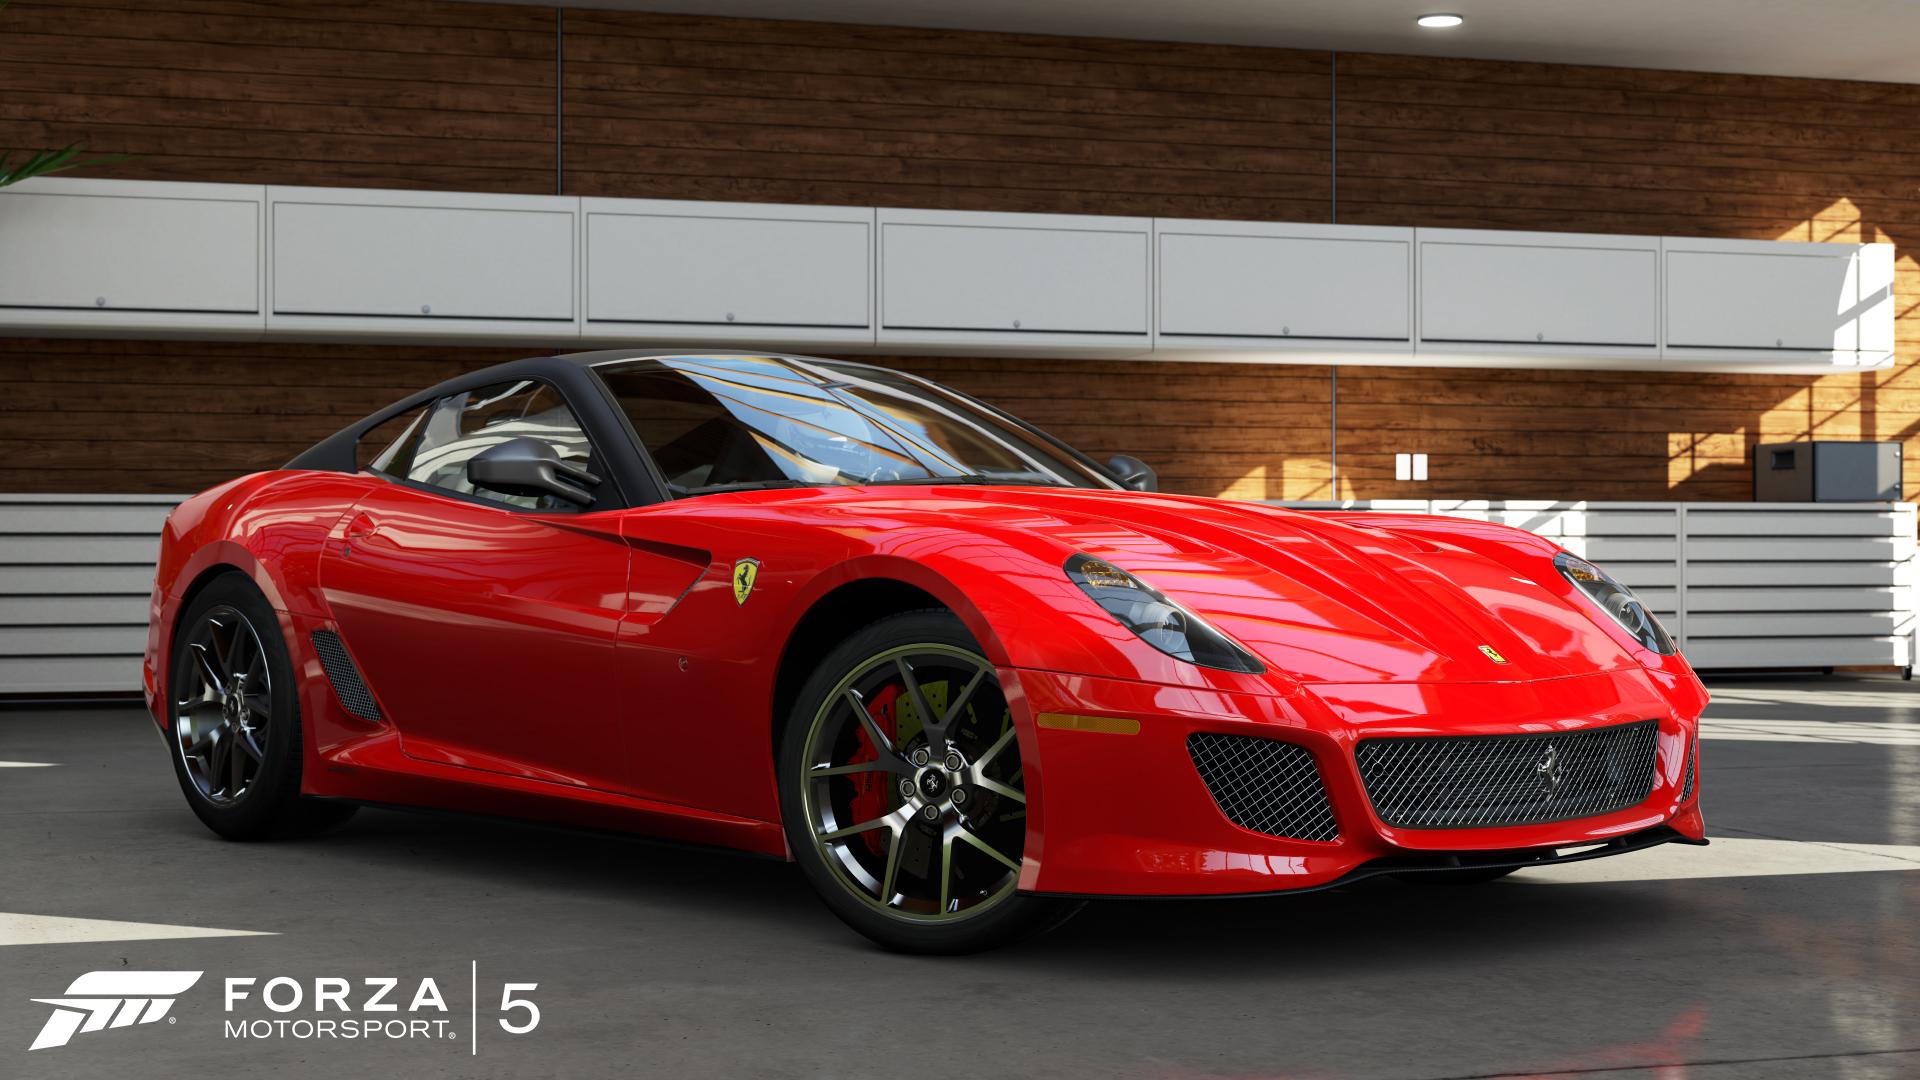 Forza-Motorsport-5-8